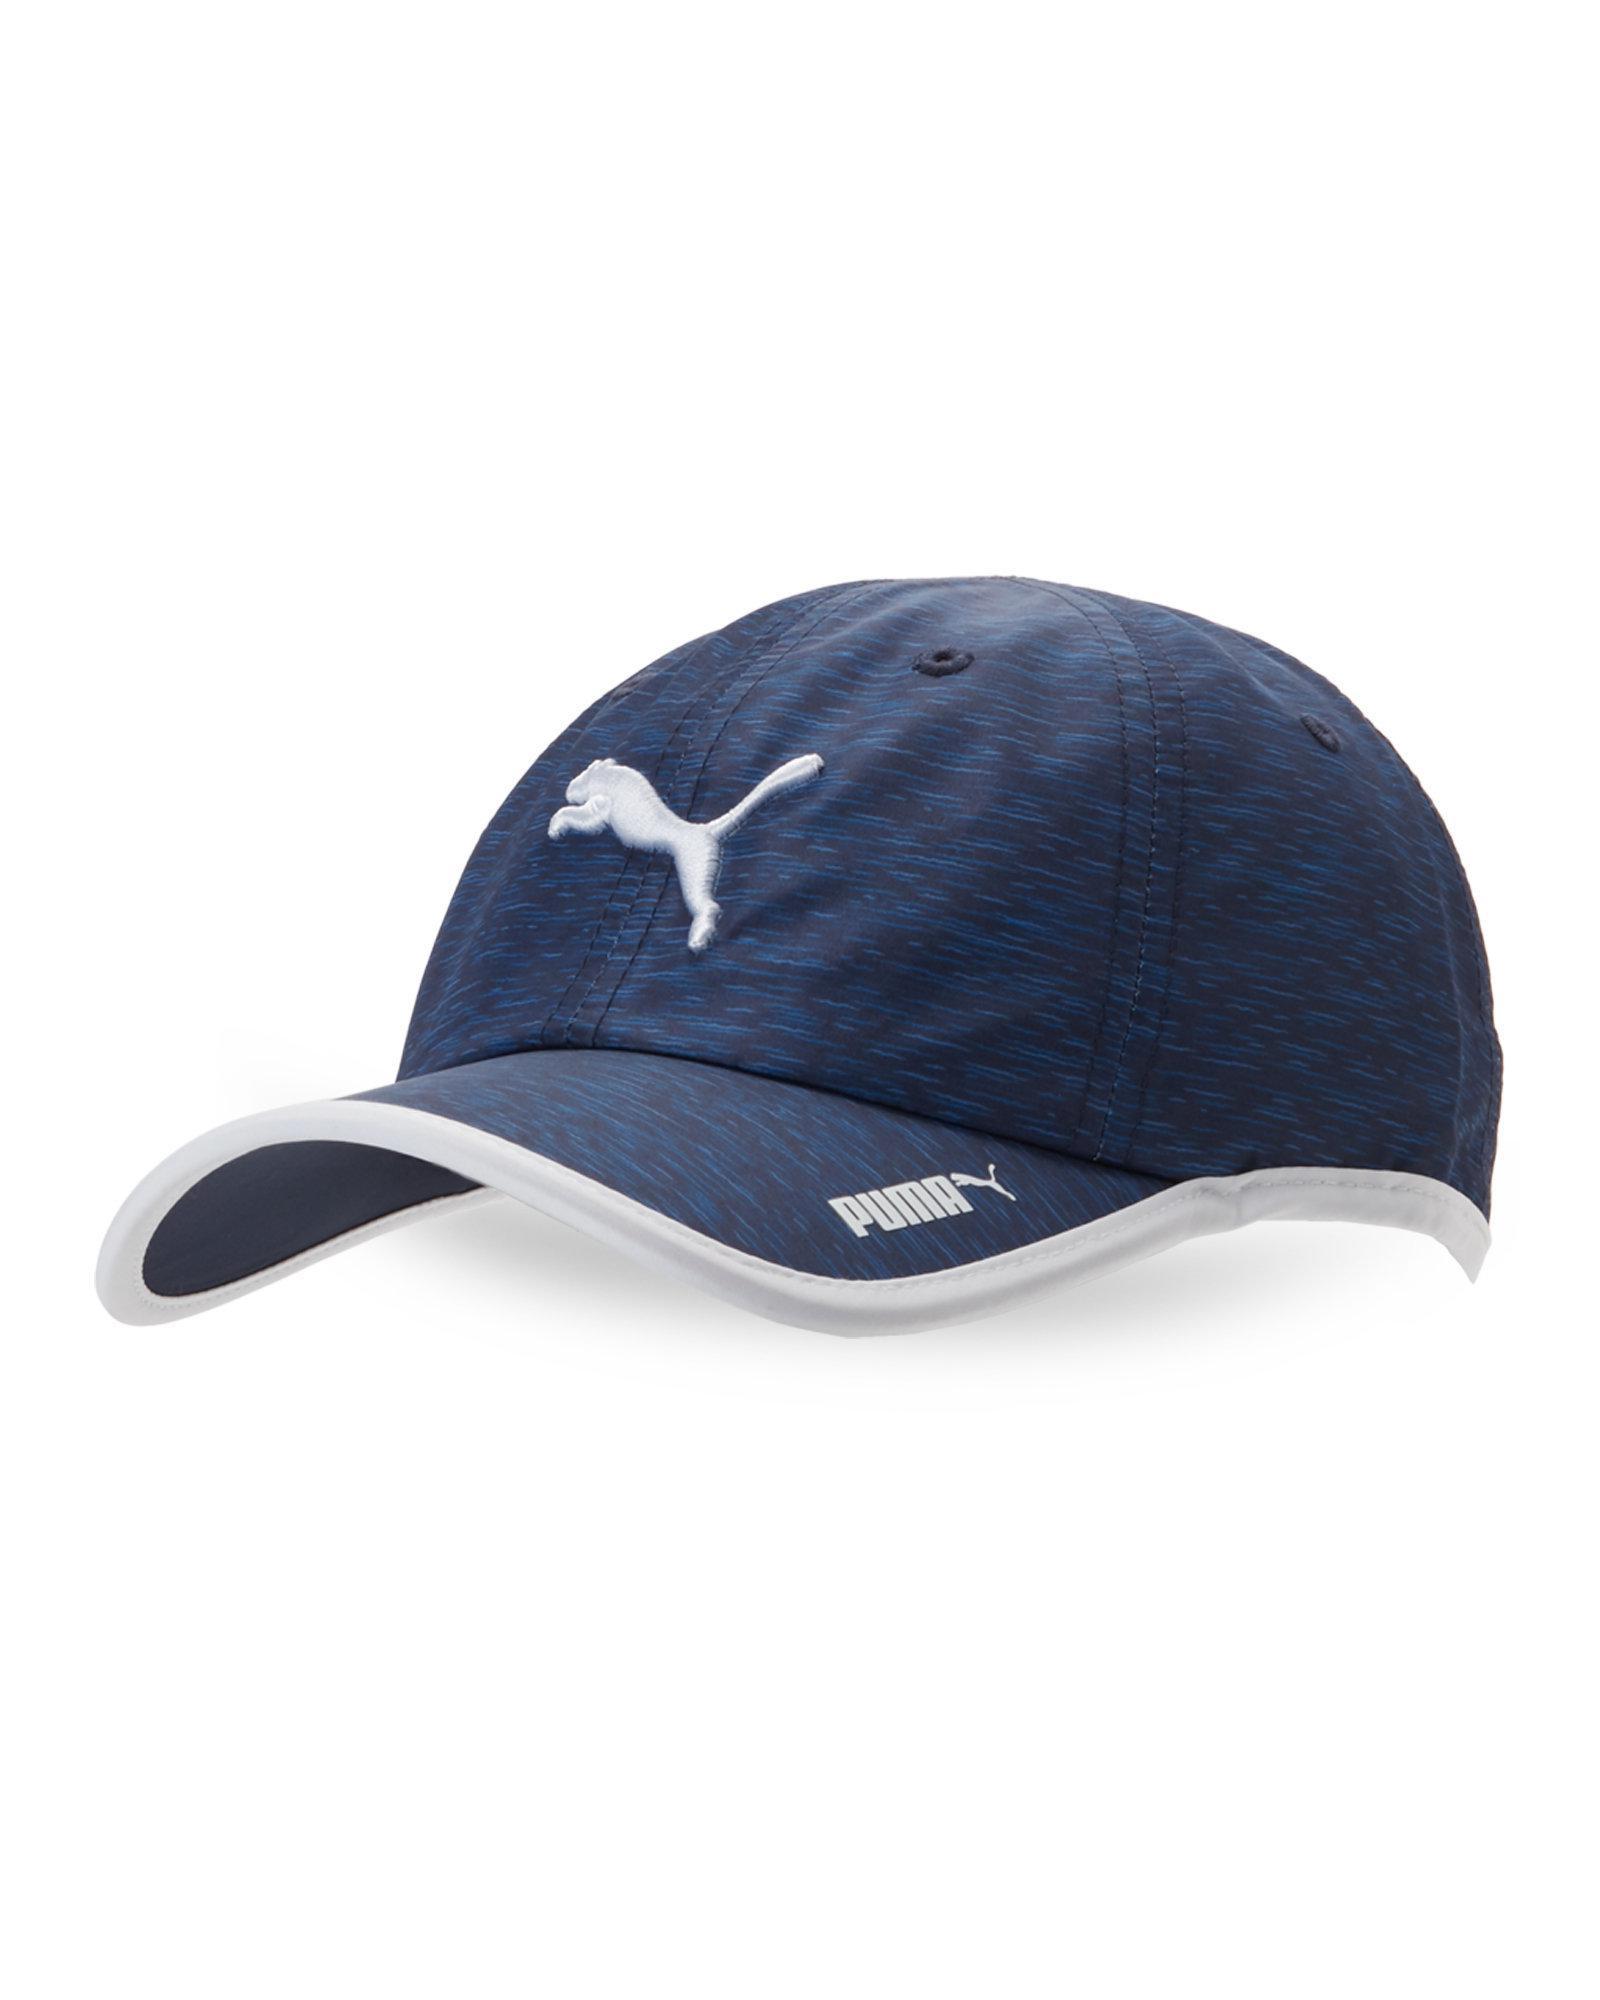 Lyst - PUMA Evercat Taylor Running Cap in Blue d382372a105